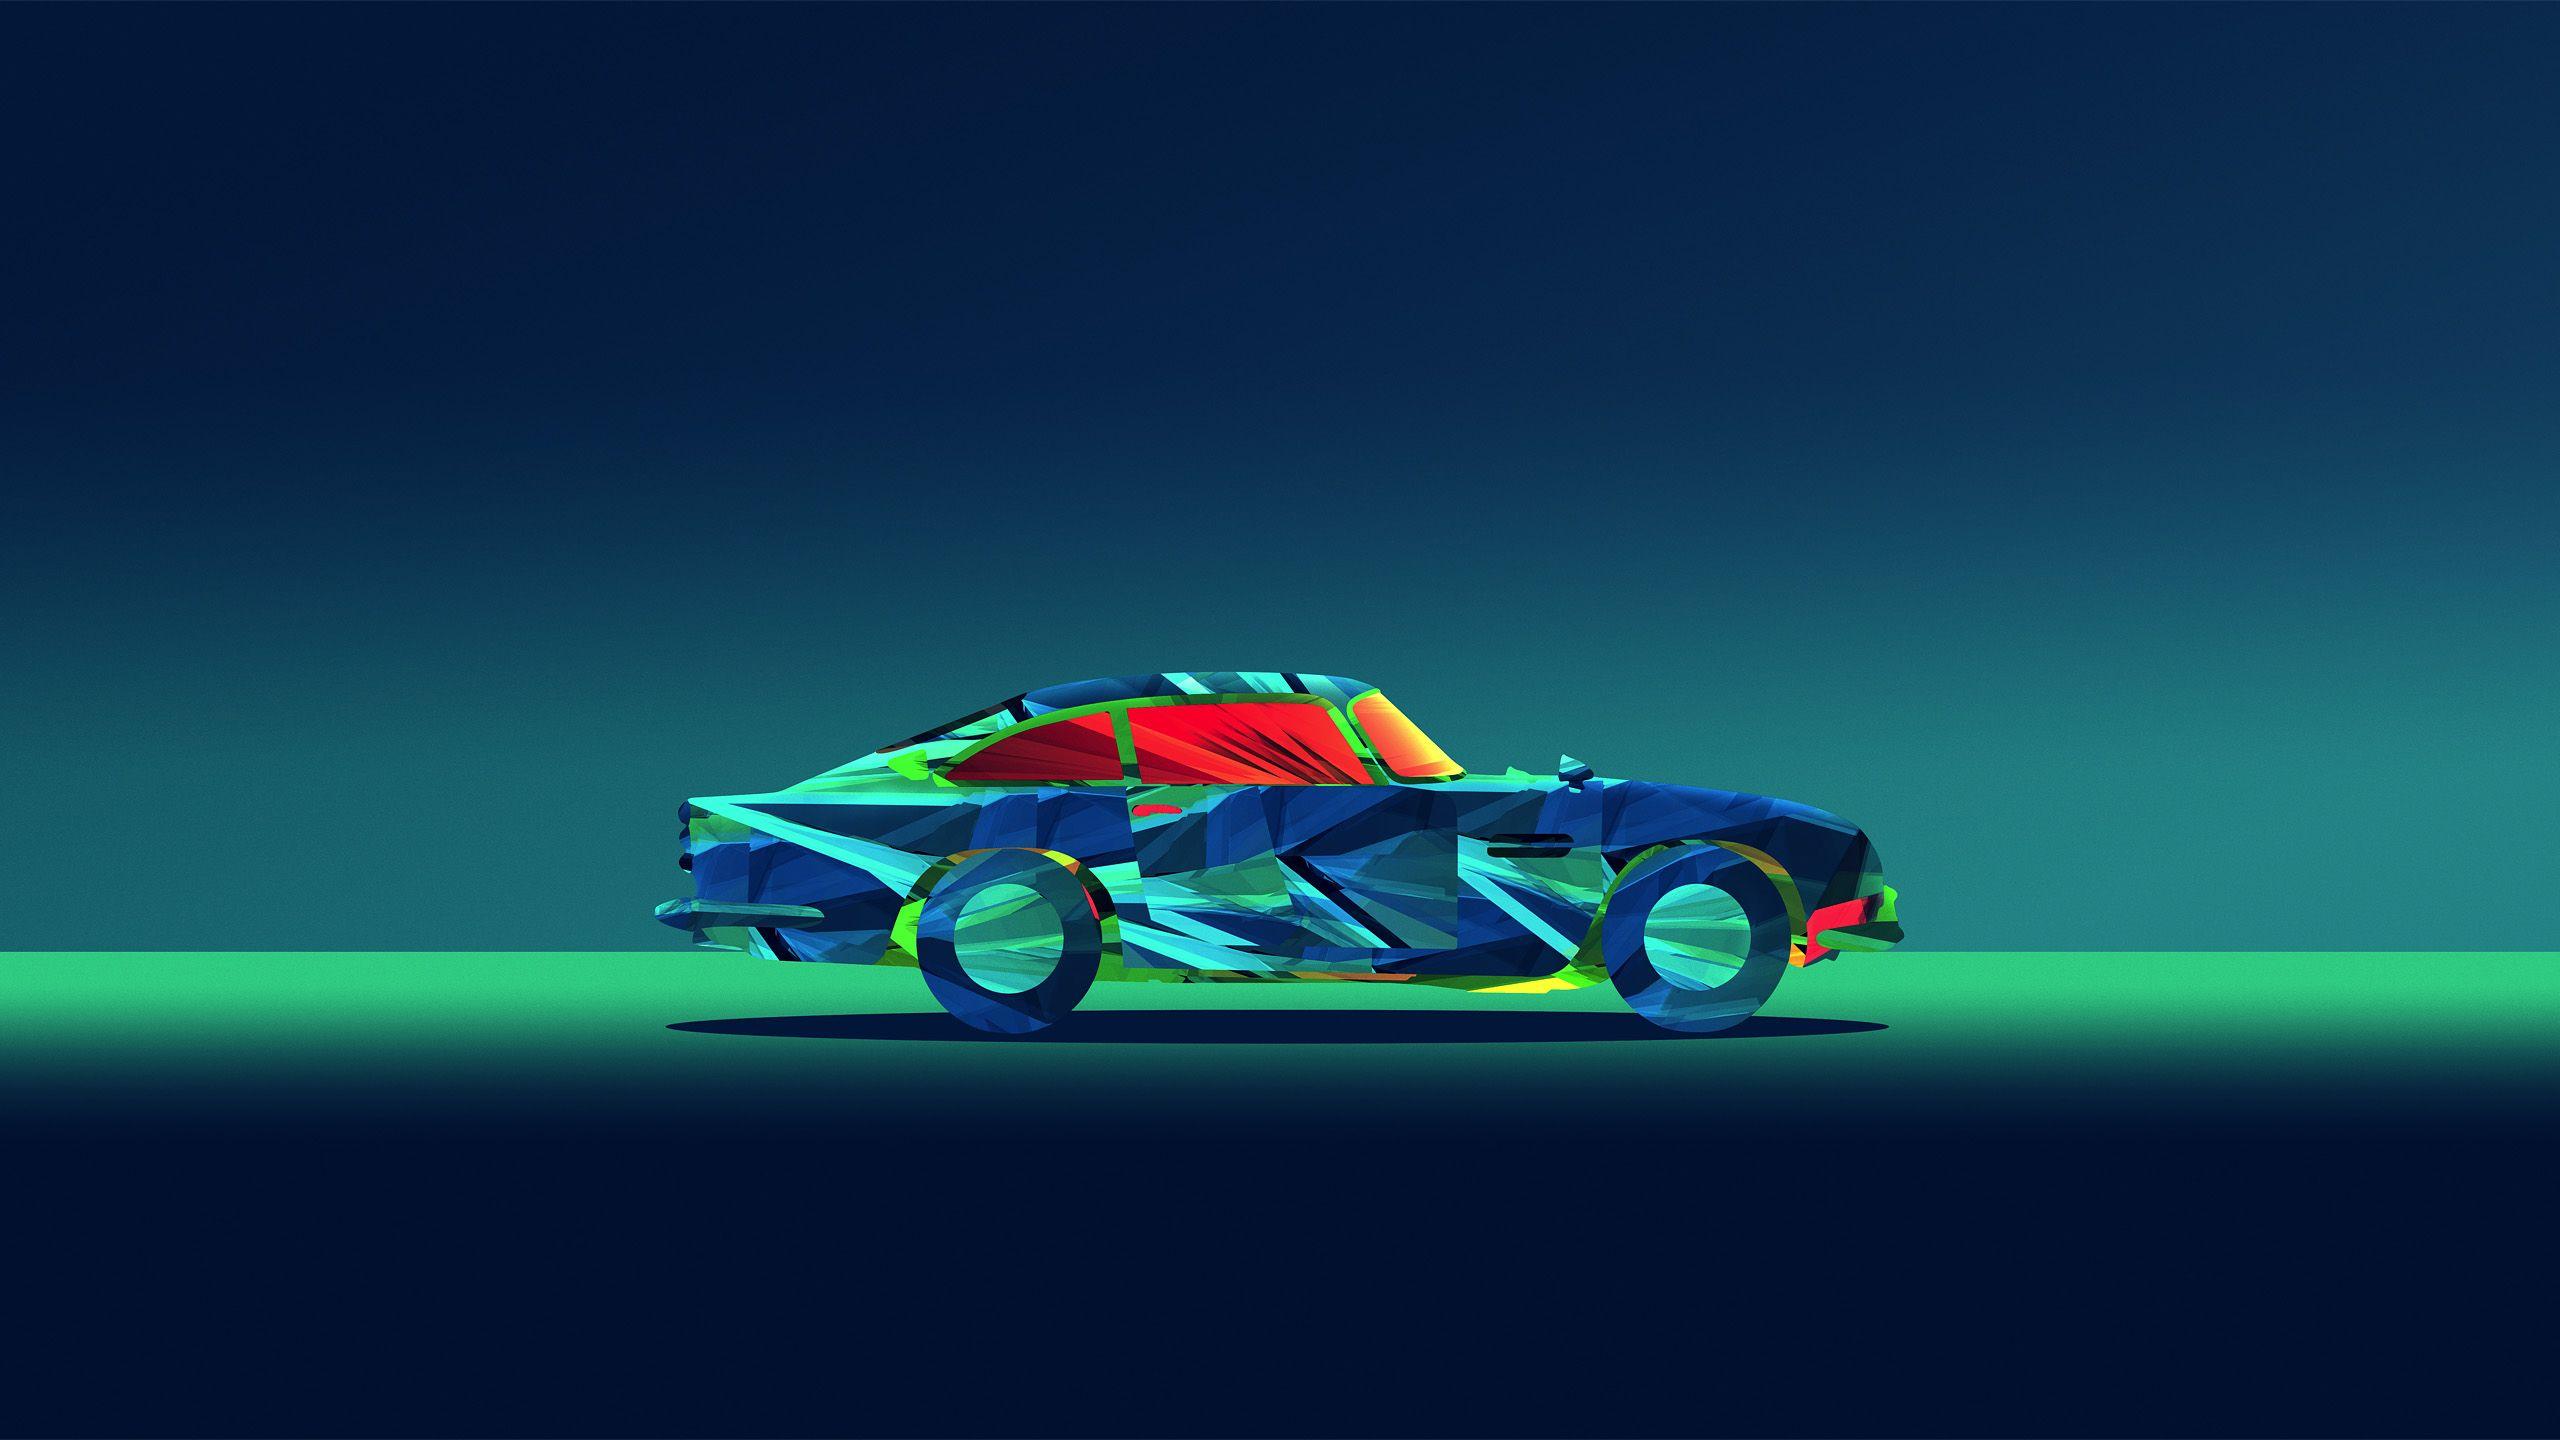 Abstract Car Facets Justin Maller Minimal Wallpaper Justin Maller Wallpapers Wallpaper